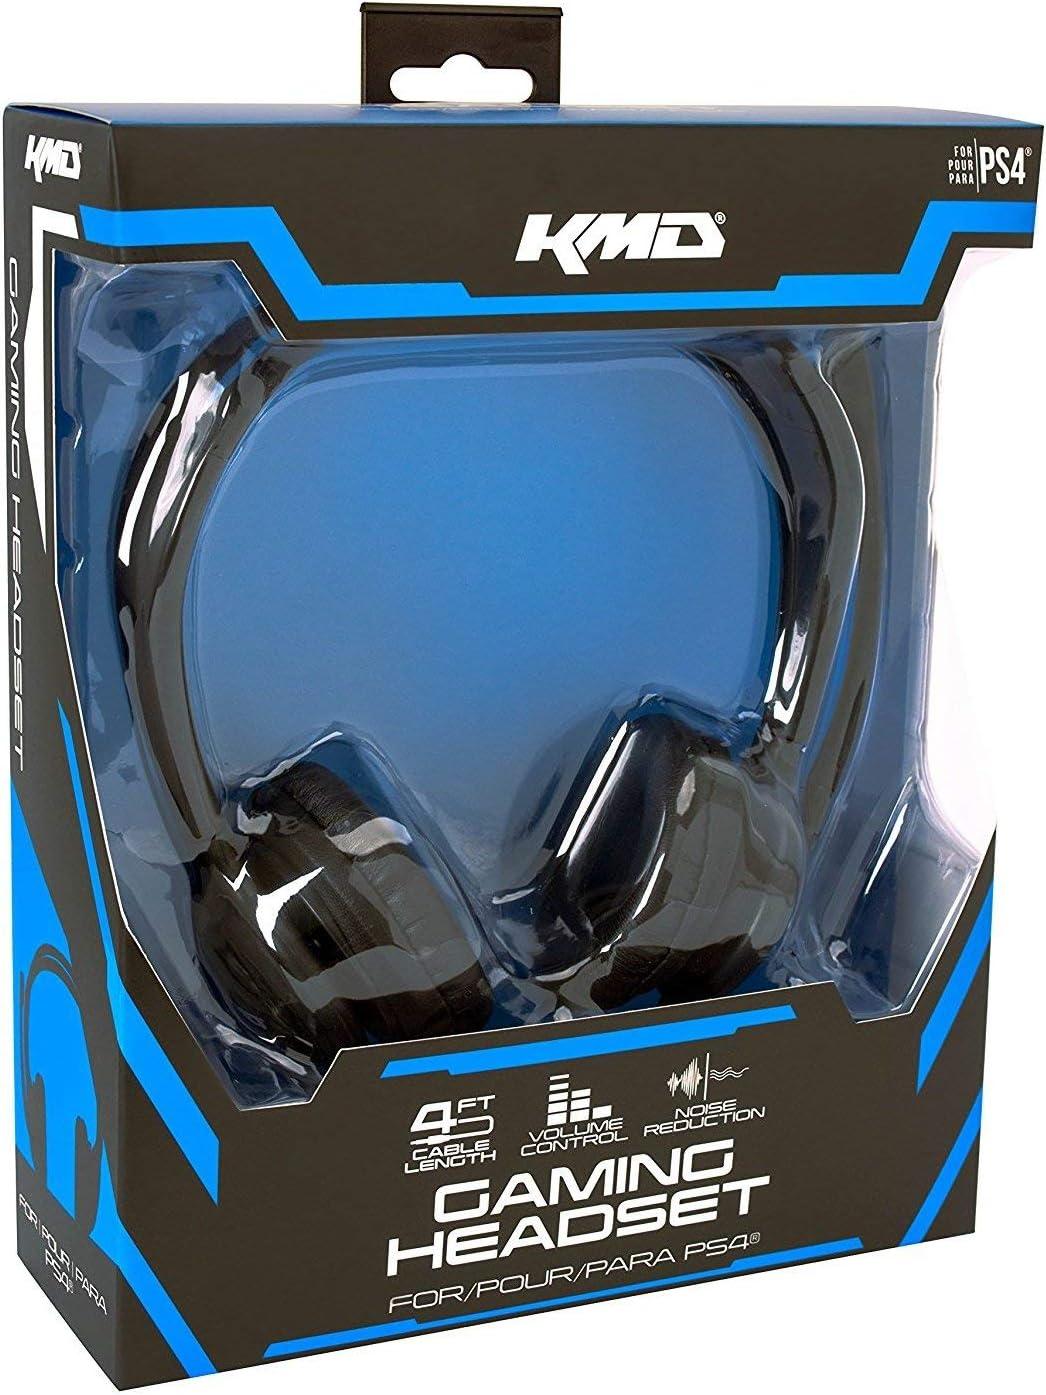 KMD Live Chat Headset for PlayStation 4 auriculares para móvil: Amazon.es: Videojuegos